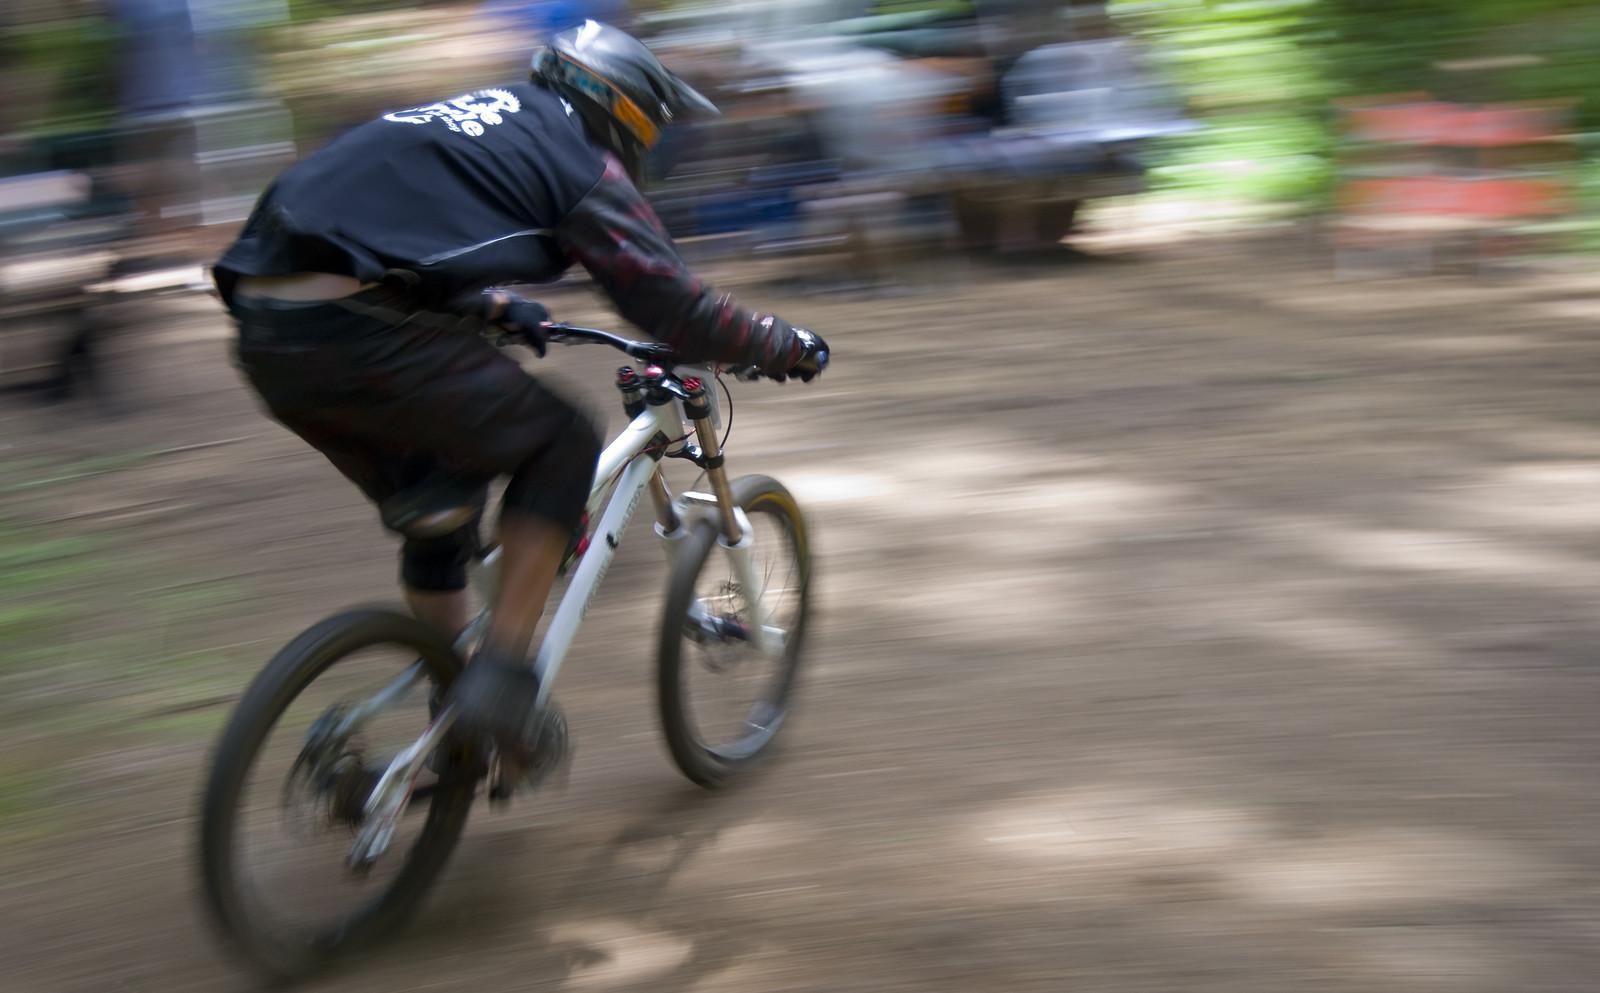 Flowcup - ryan_daugherty - Mountain Biking Pictures - Vital MTB